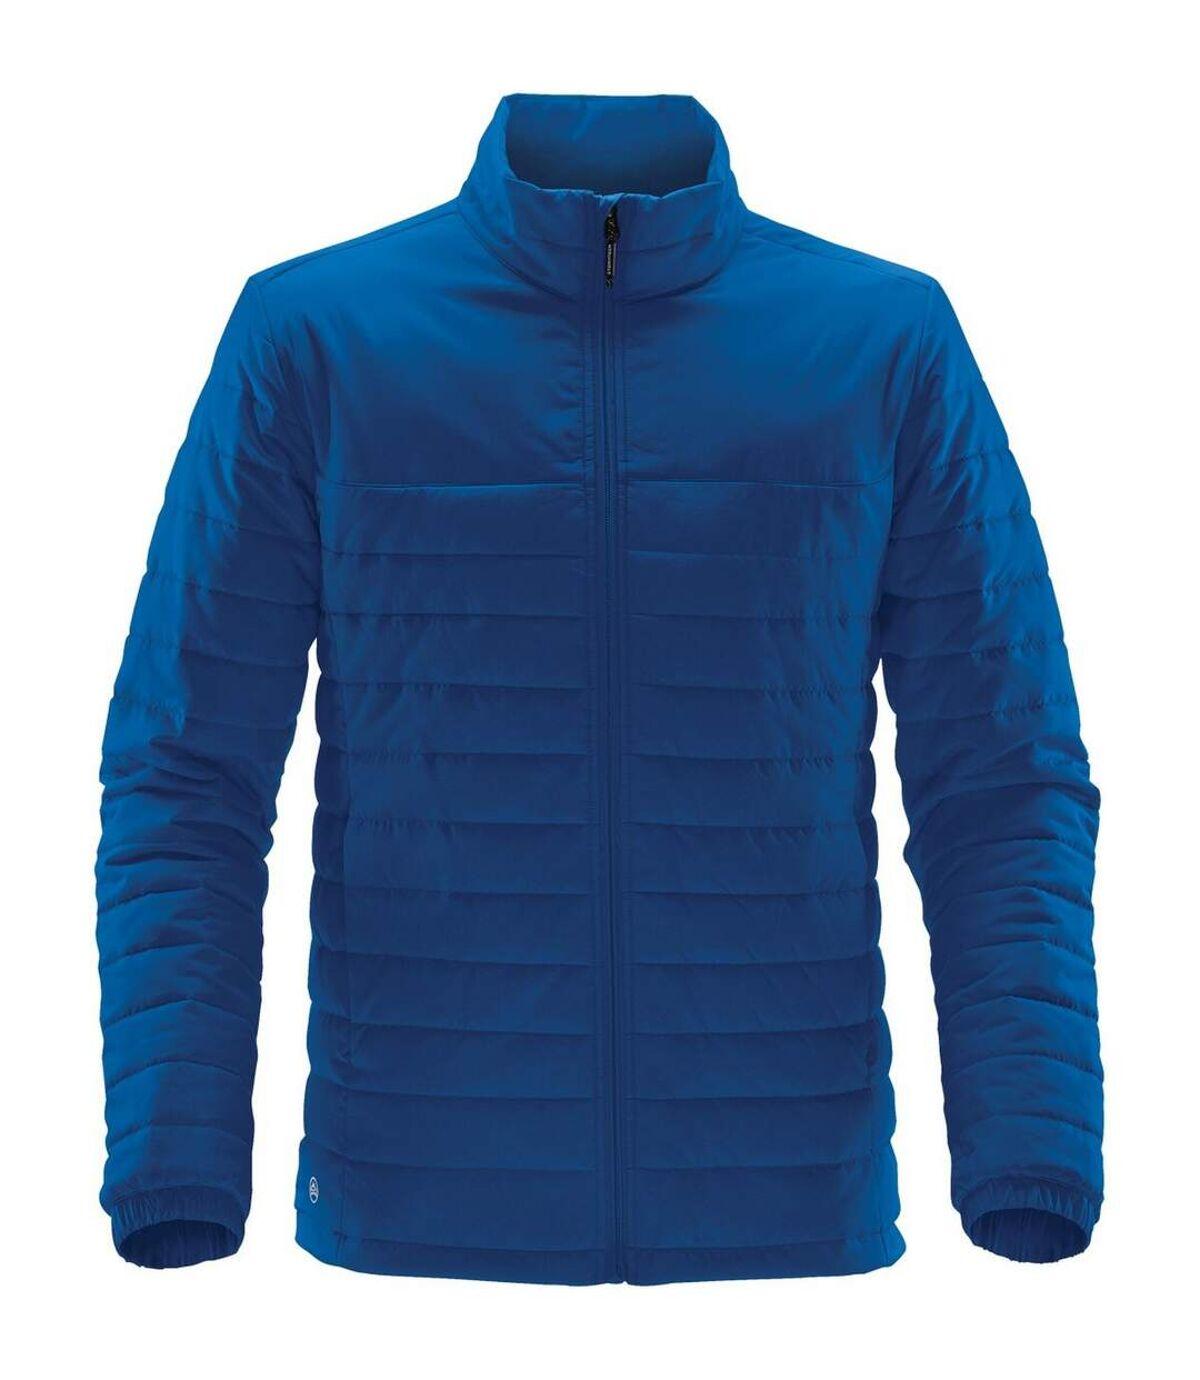 Stormtech Mens Nautilus Jacket (Azure Blue) - UTBC4125